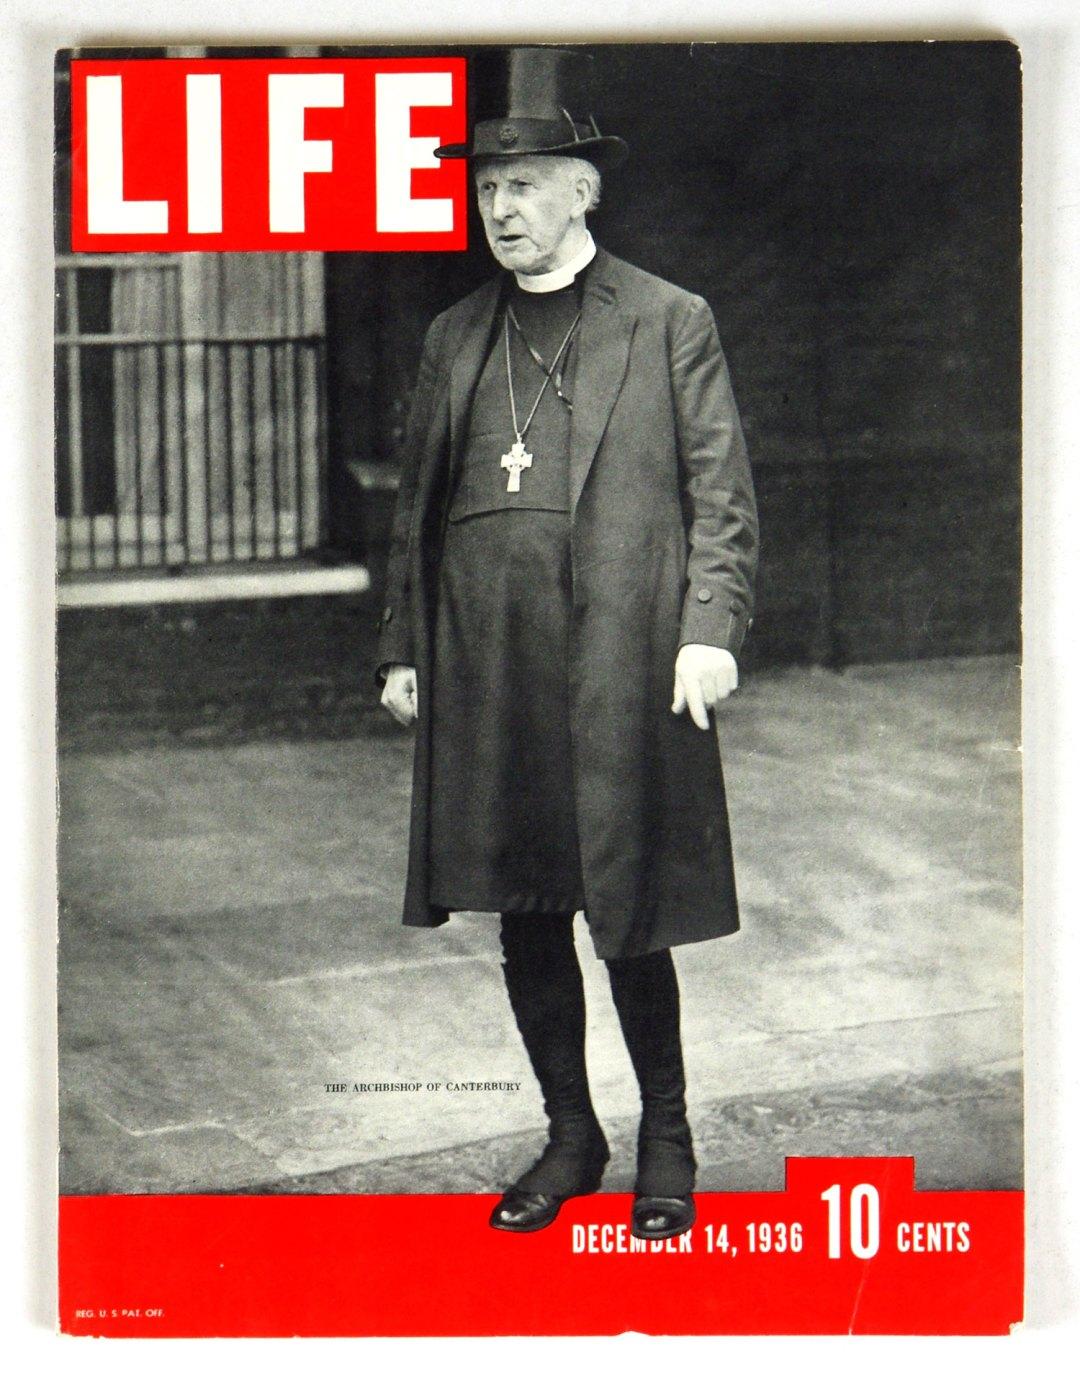 LIFE Magazine 1936 Dec 14 The Archbishop of Canterbury